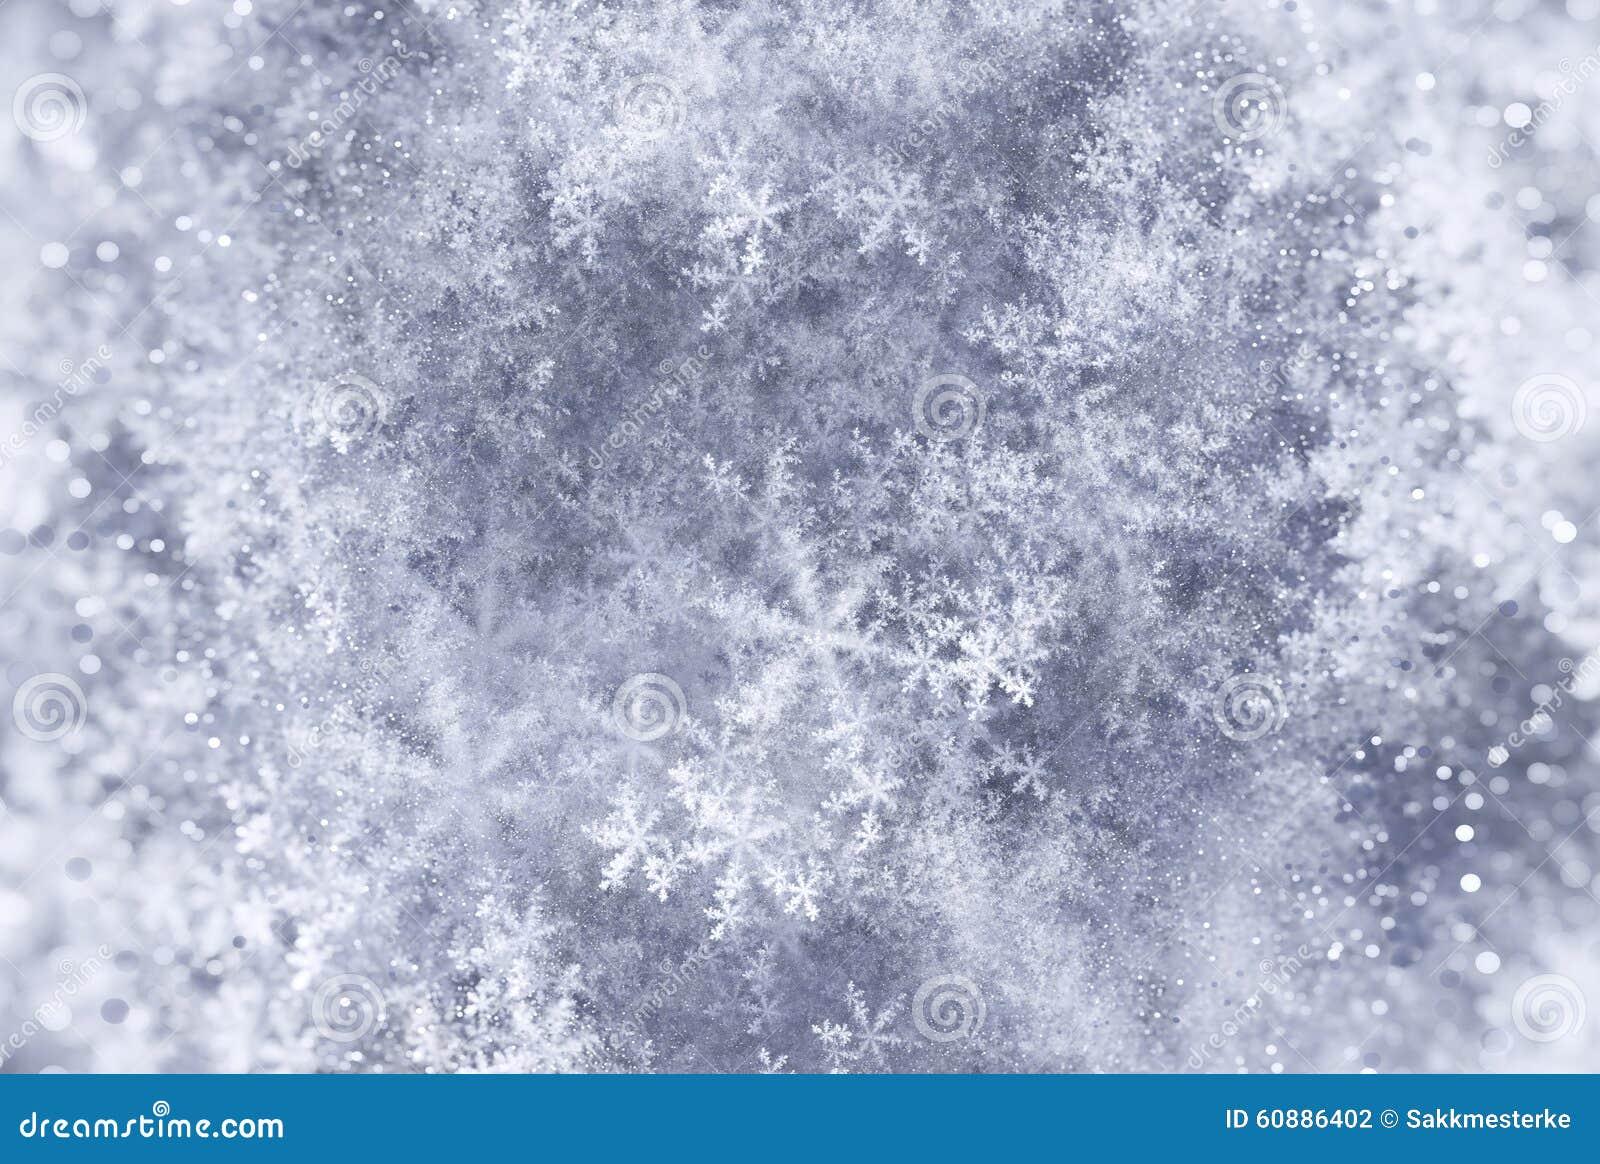 Elegant Christmas Background With Snowflakes Stock Vector: Elegant Christmas Background With Snowflakes Fractal Stock